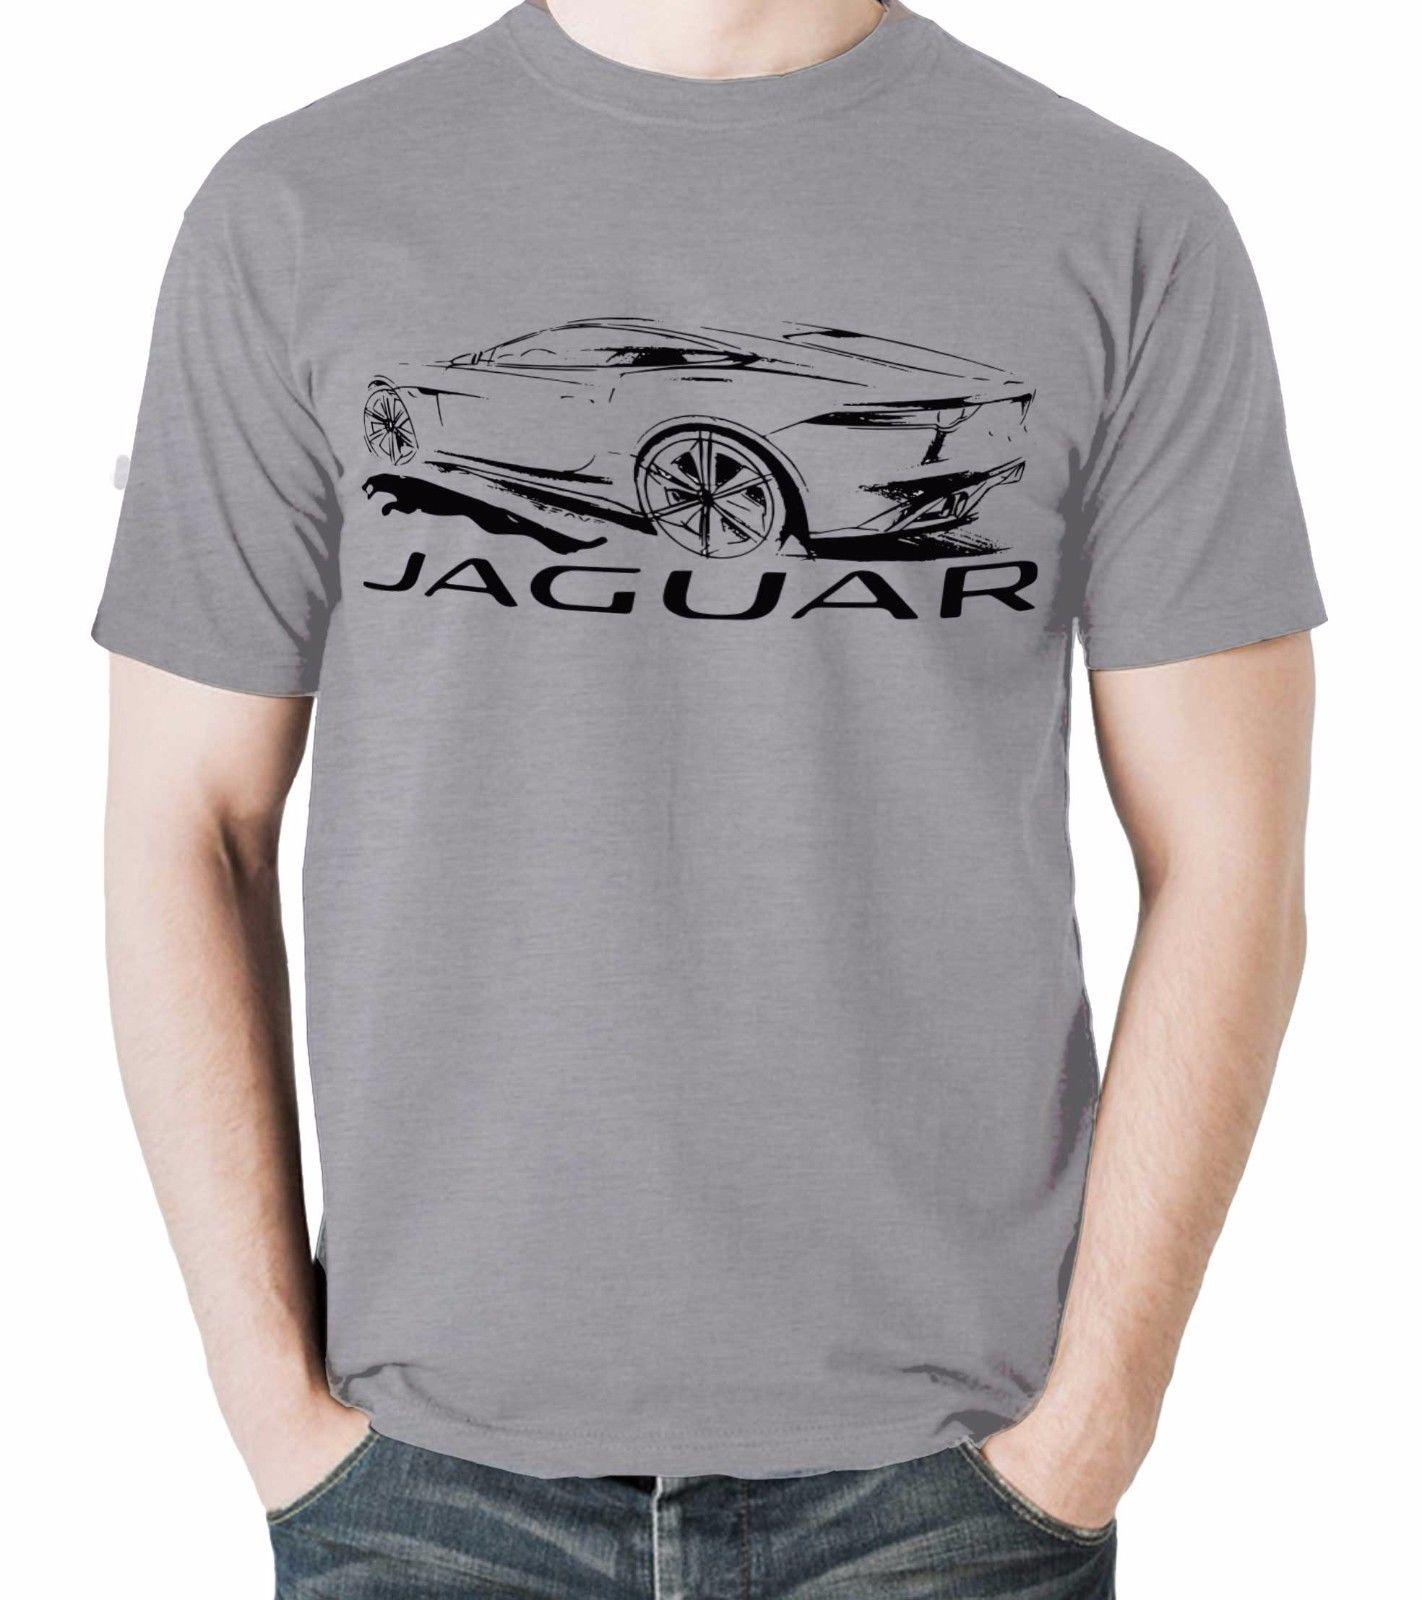 t tee sport sleeveless mens jaguar shirts itm graphic tiger running tank top animal